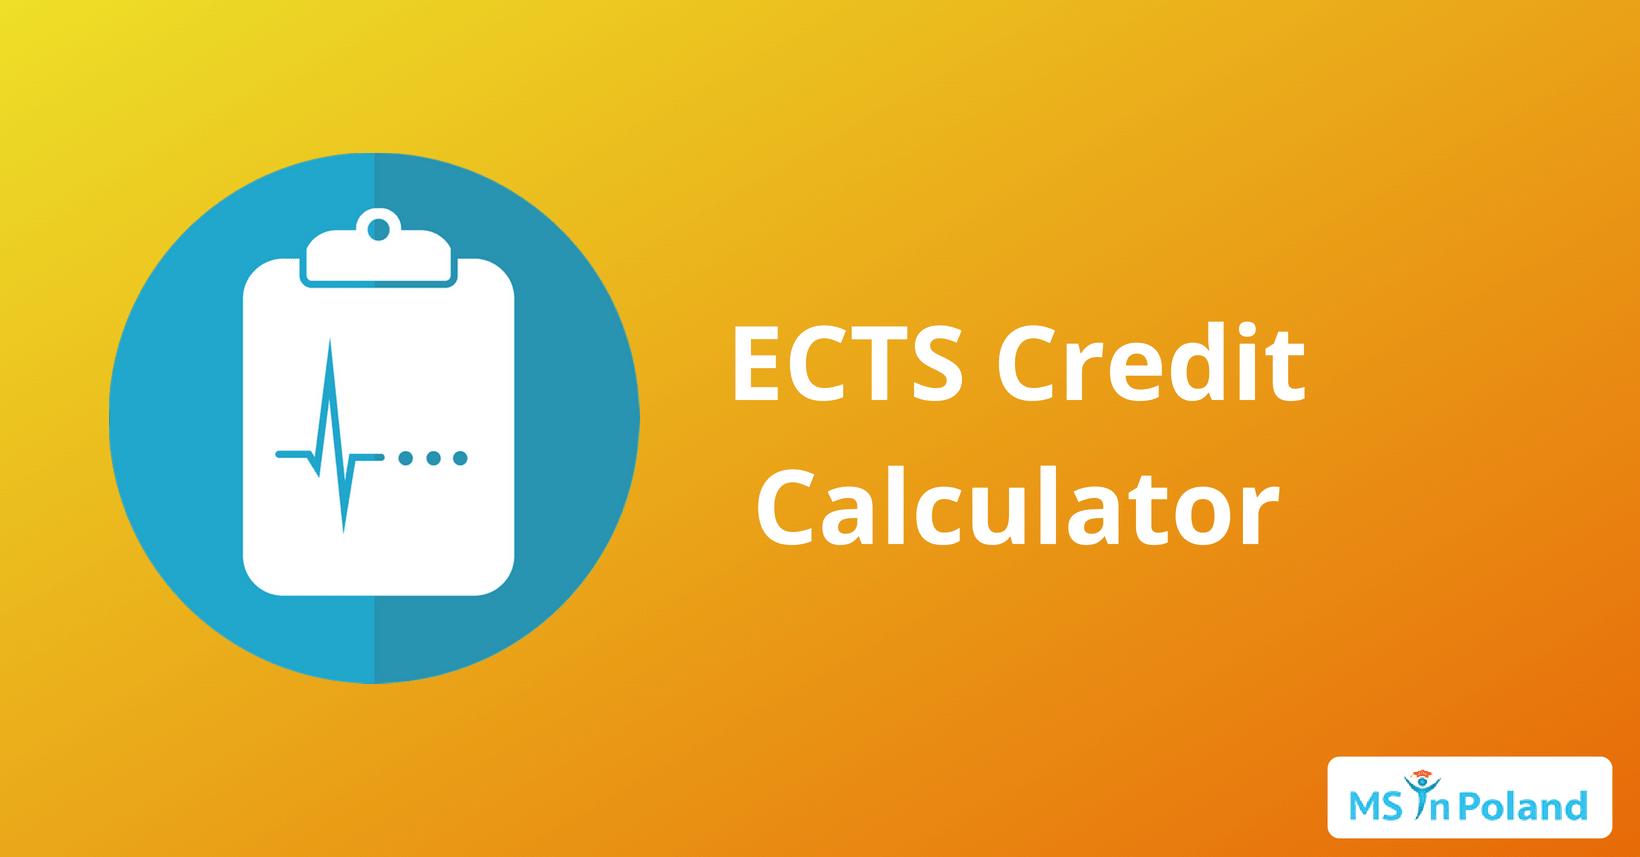 Ects Calculator